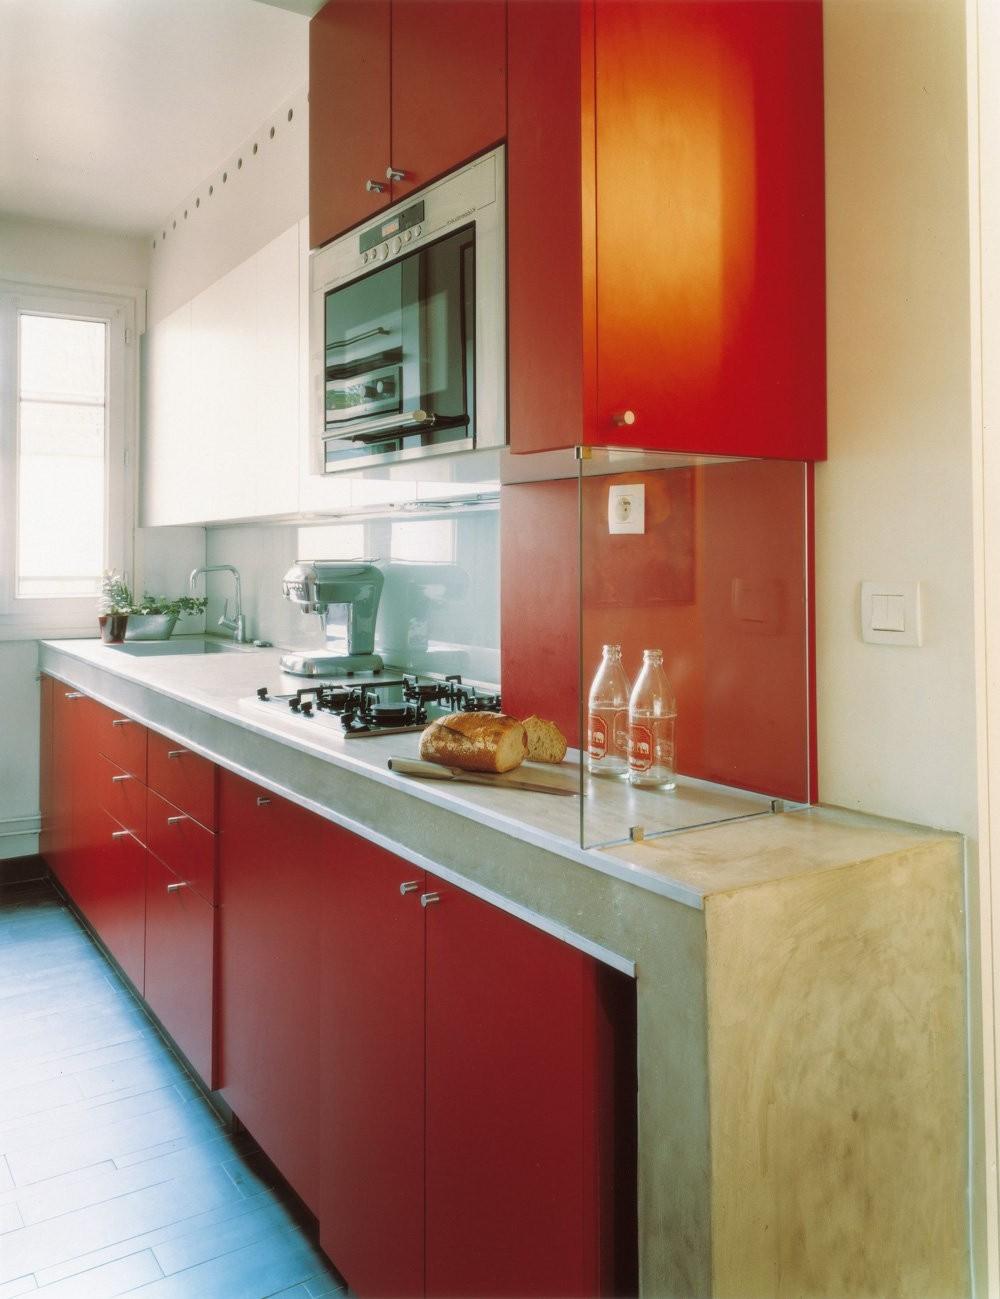 Modele paillasse de cuisine cuisine id es de for Modele de decoration de cuisine